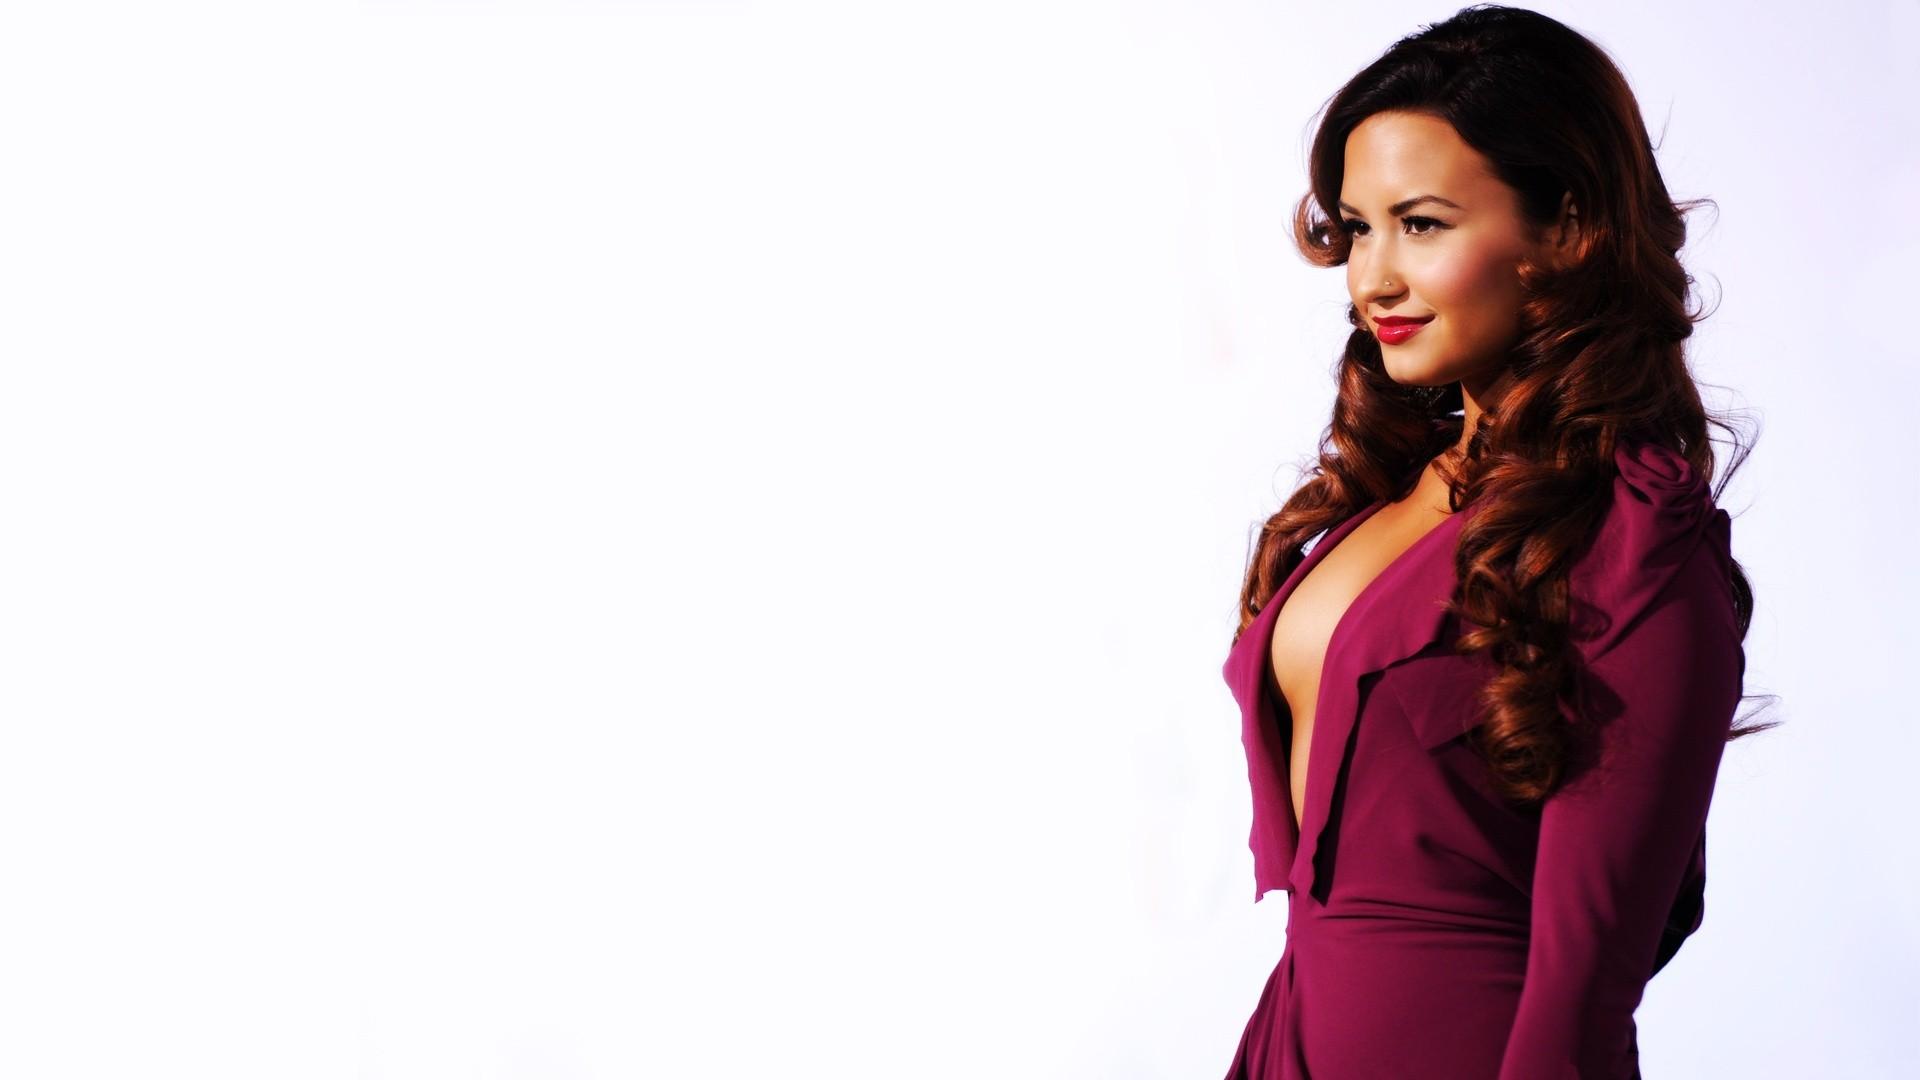 Hot Demi Lovato   Wallpaper High Definition High Quality Widescreen 1920x1080